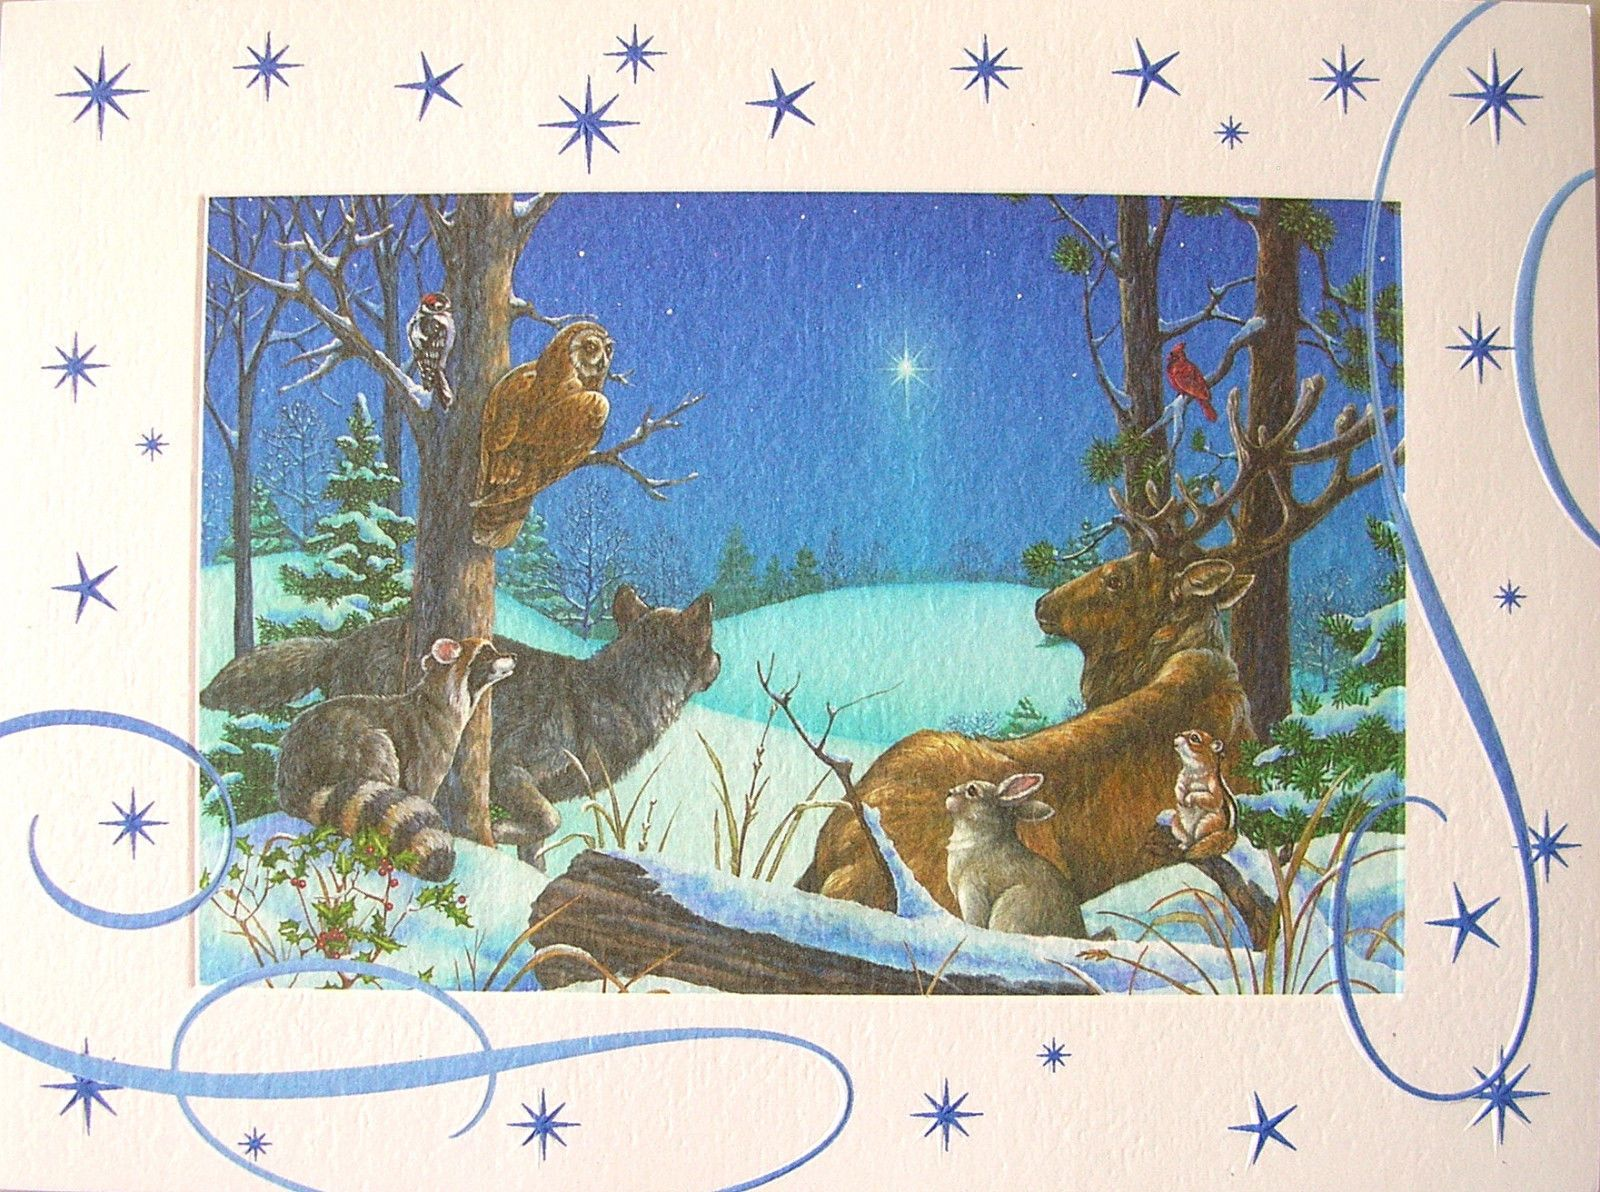 Leanin tree elaine maier animals owl deer wildlife christmas star leanin tree elaine maier animals owl deer wildlife christmas star greeting card kristyandbryce Images